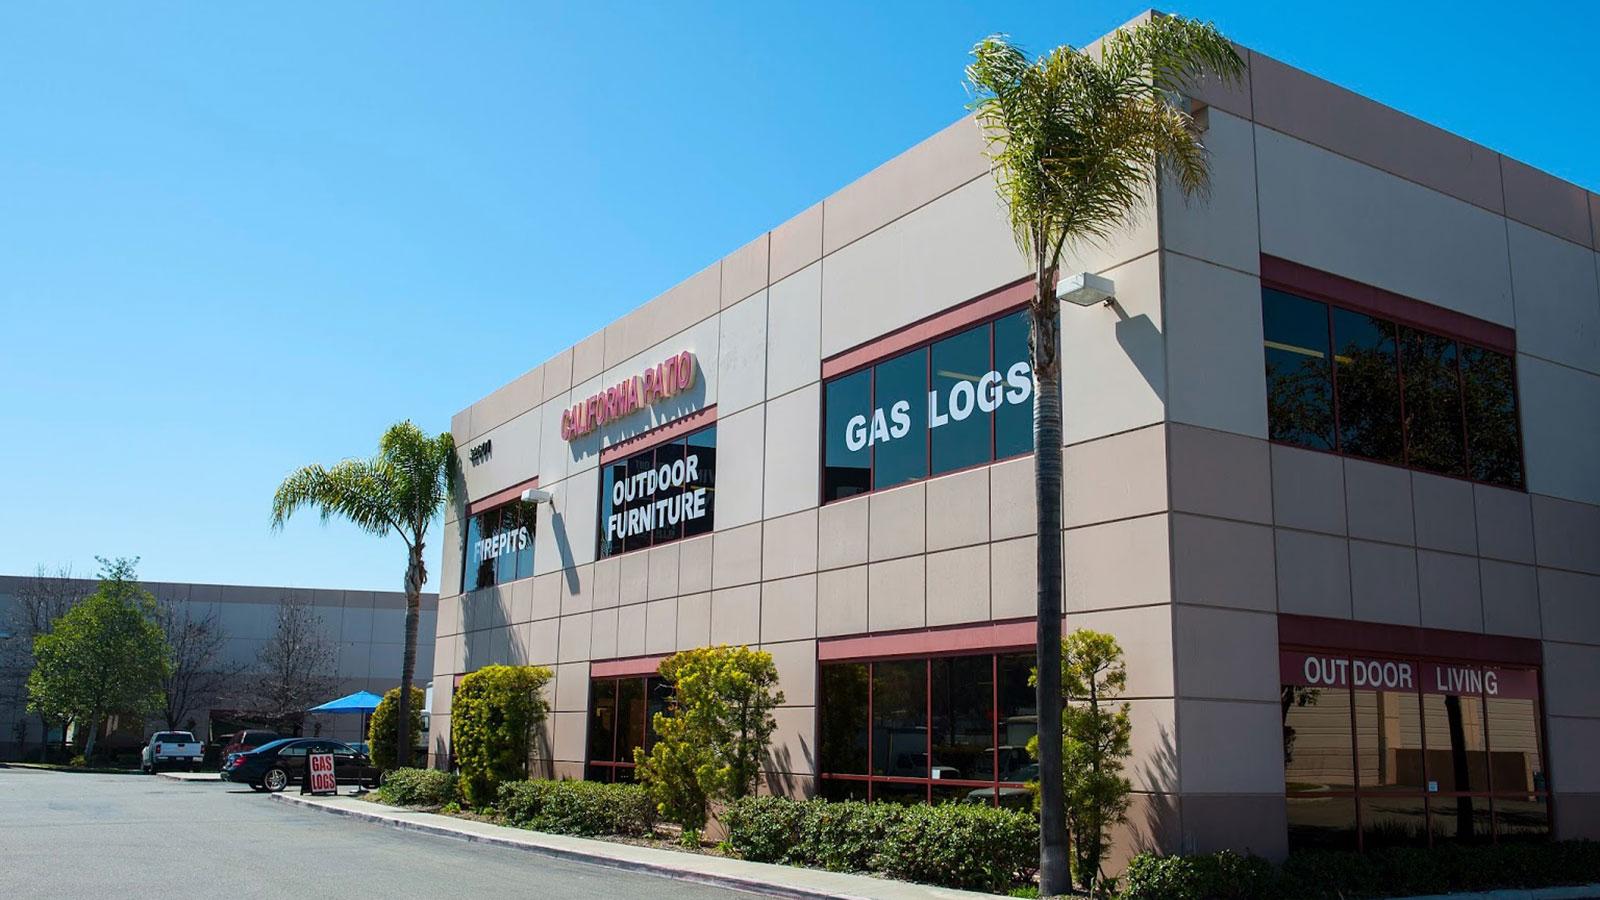 California Patio Storefront San Juan Capistrano, CA